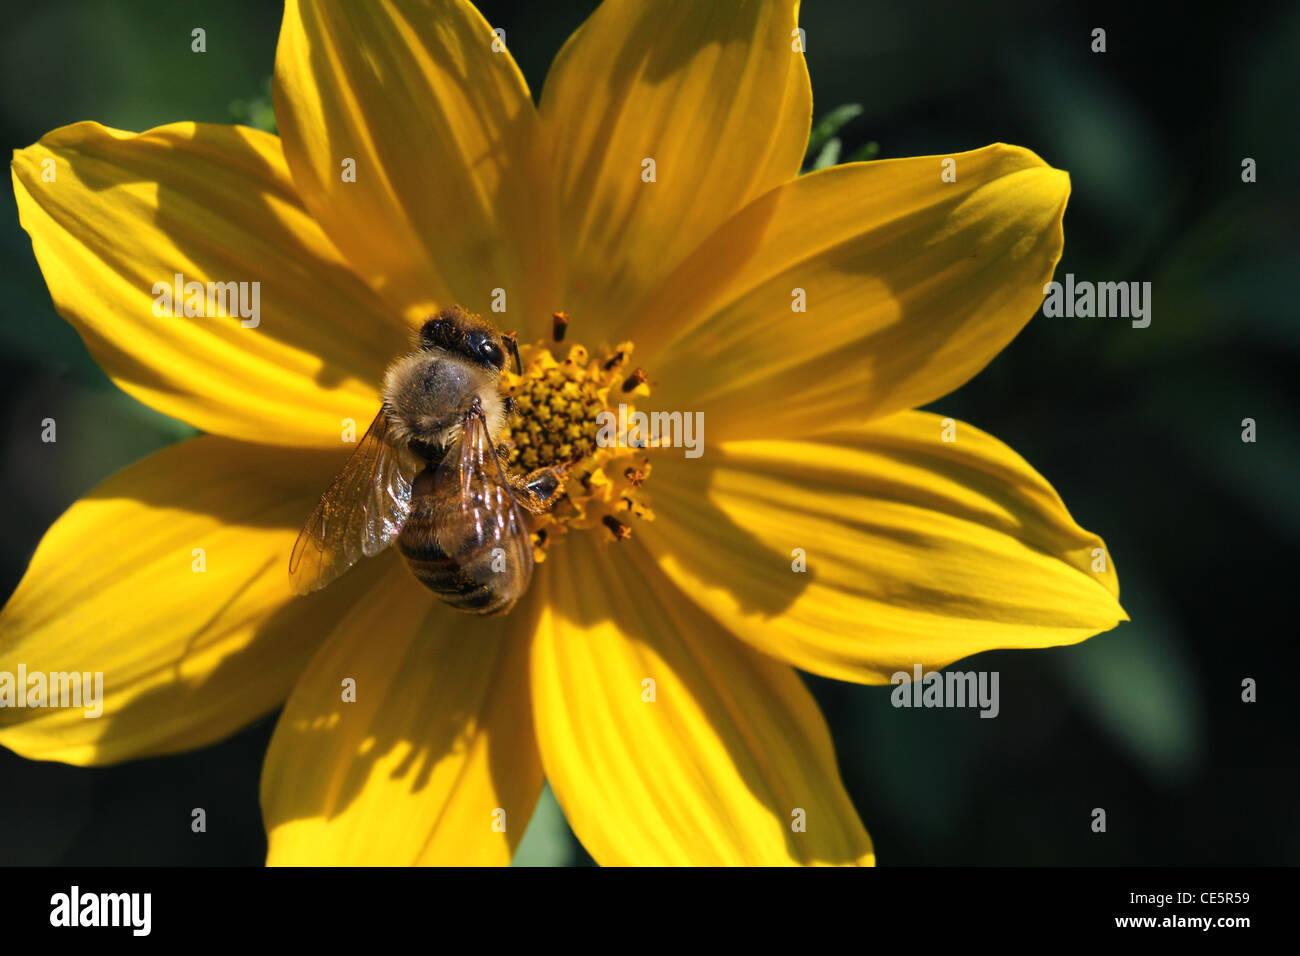 honey bee collect pollen feeding common sunflower - Stock Image